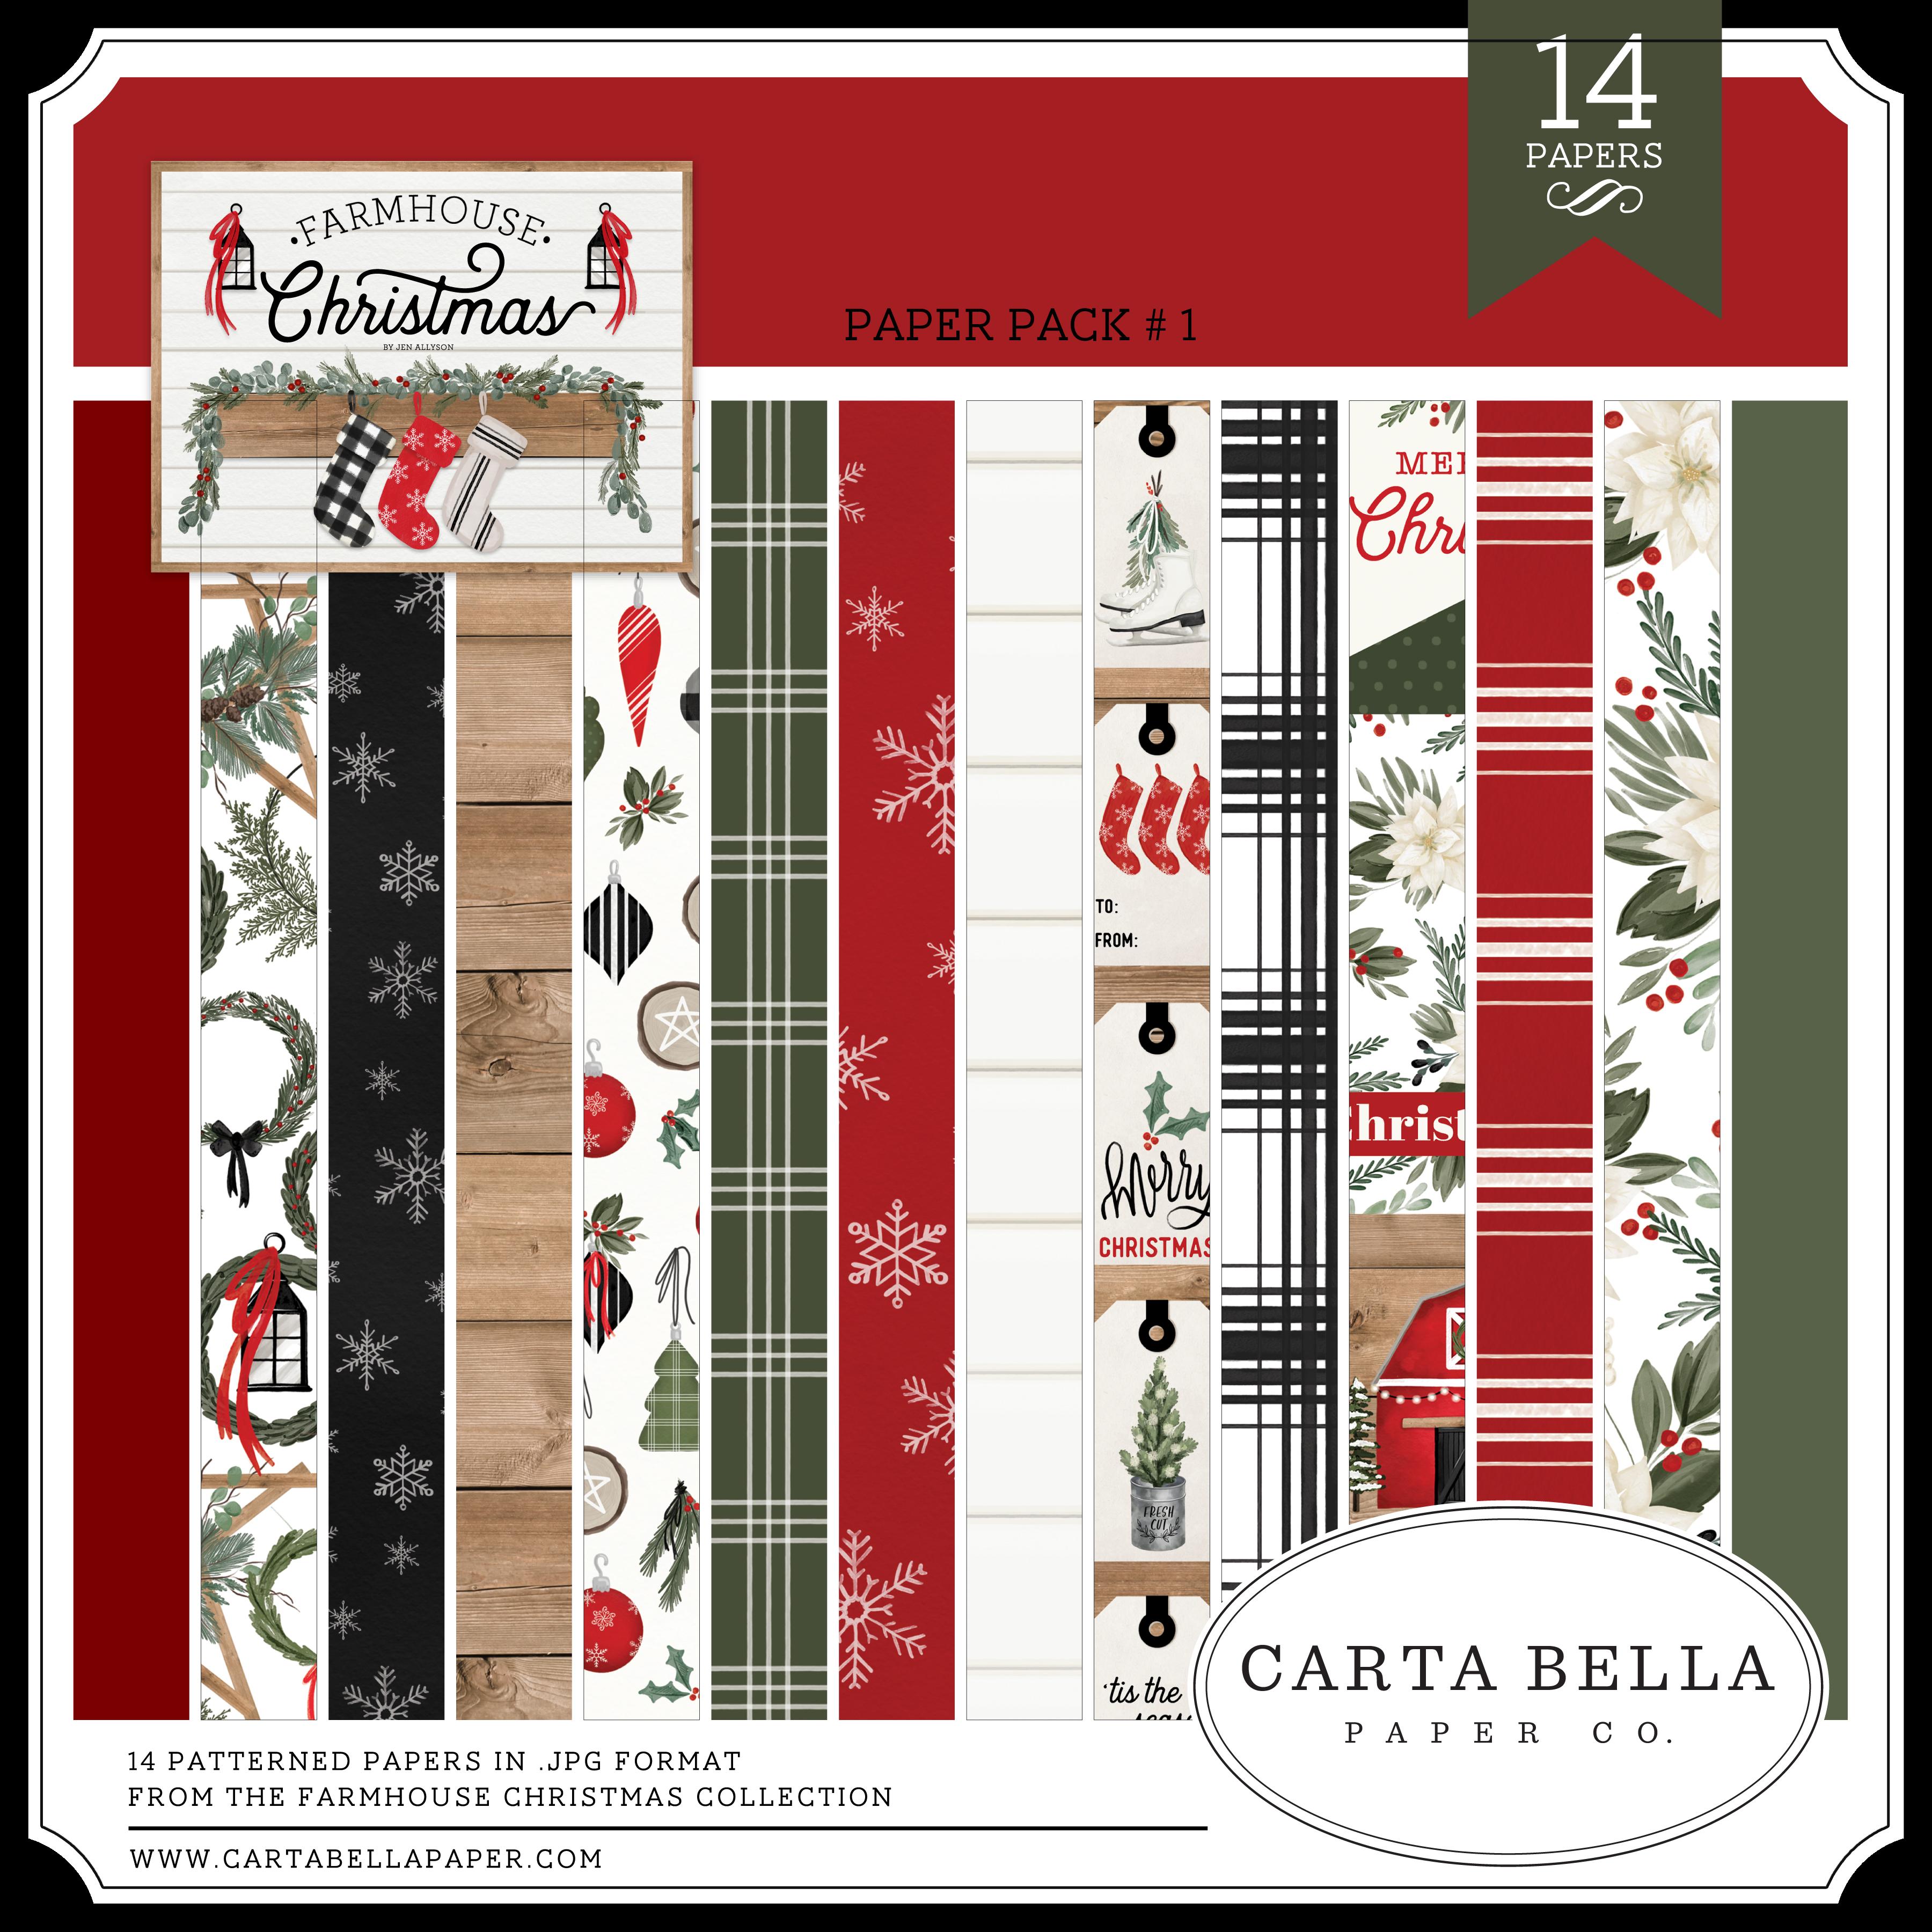 Farmhouse Christmas Paper Pack #1